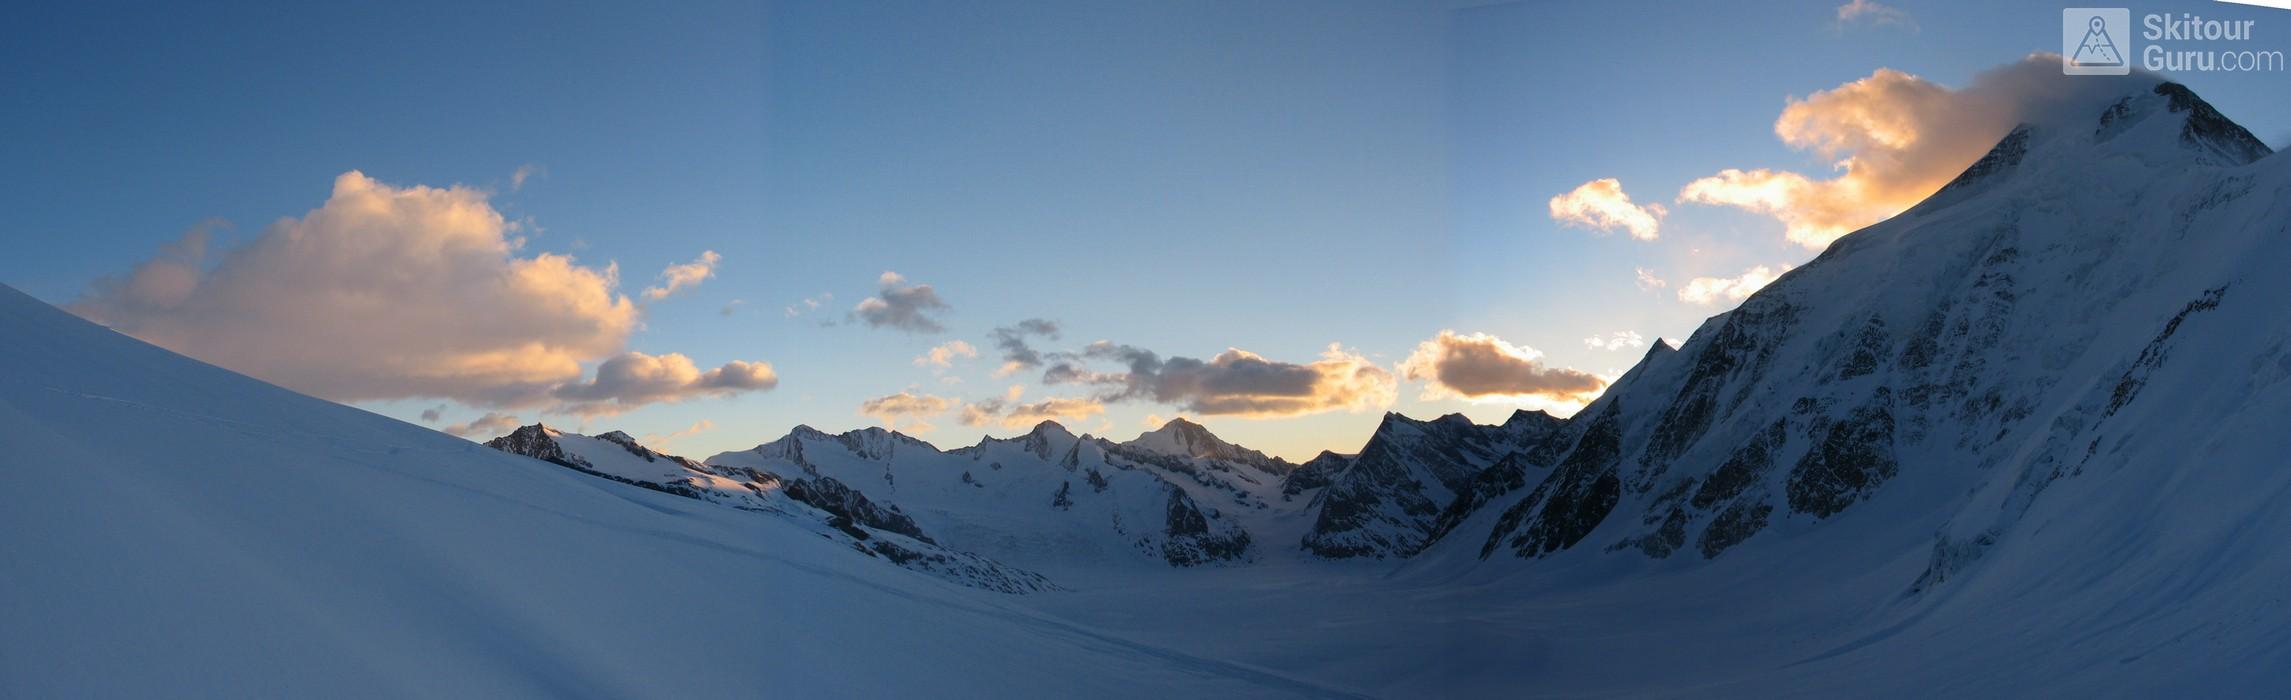 Hollandiahütte (Lötschenhütte) Berner Alpen / Alpes bernoises Švýcarsko panorama 23